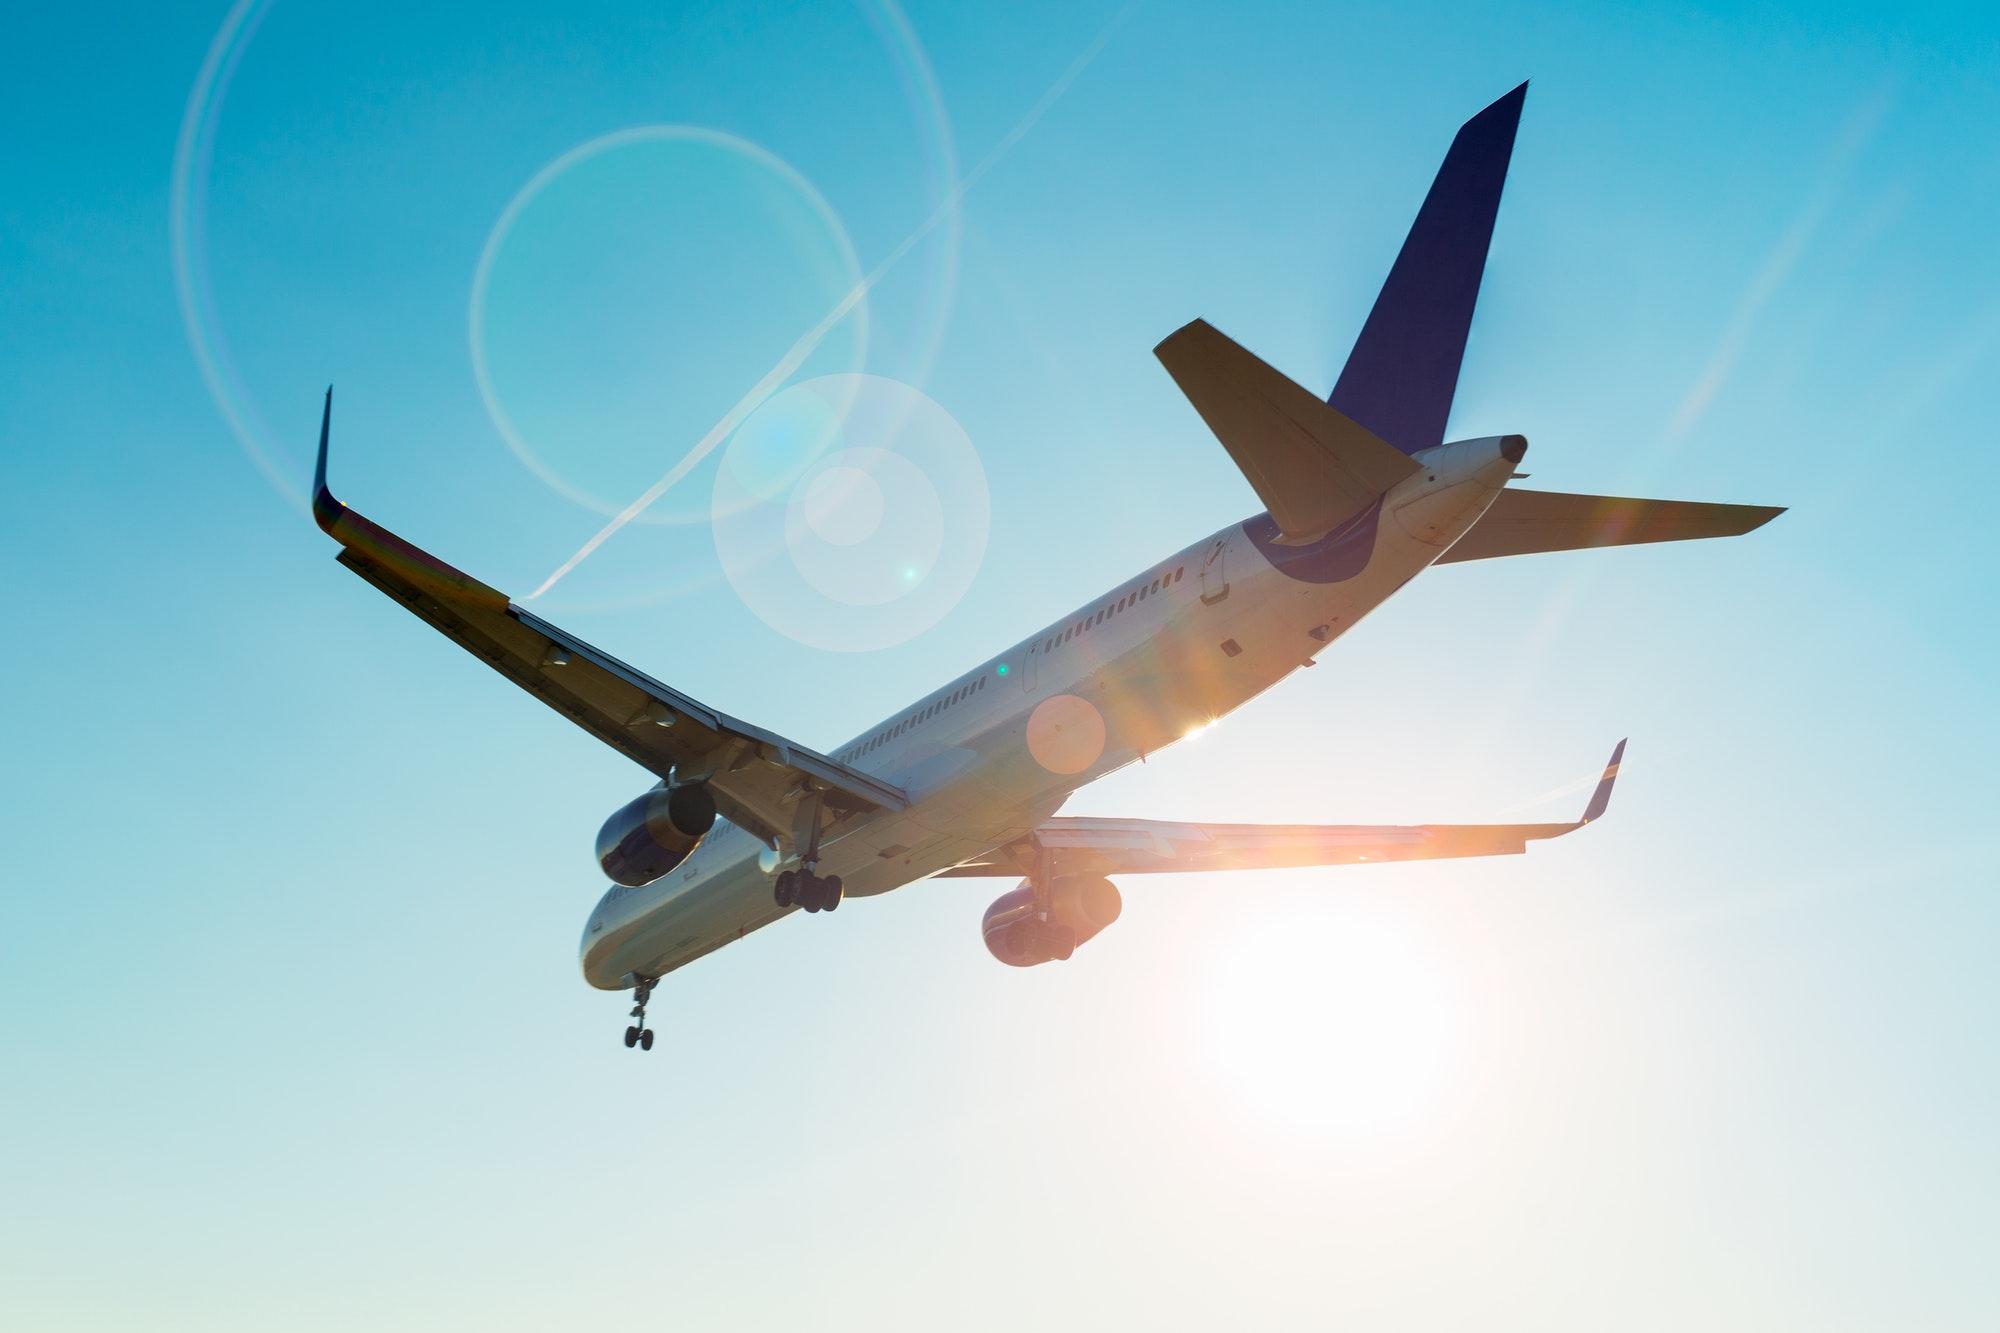 Aeroplane is flying landing at airport